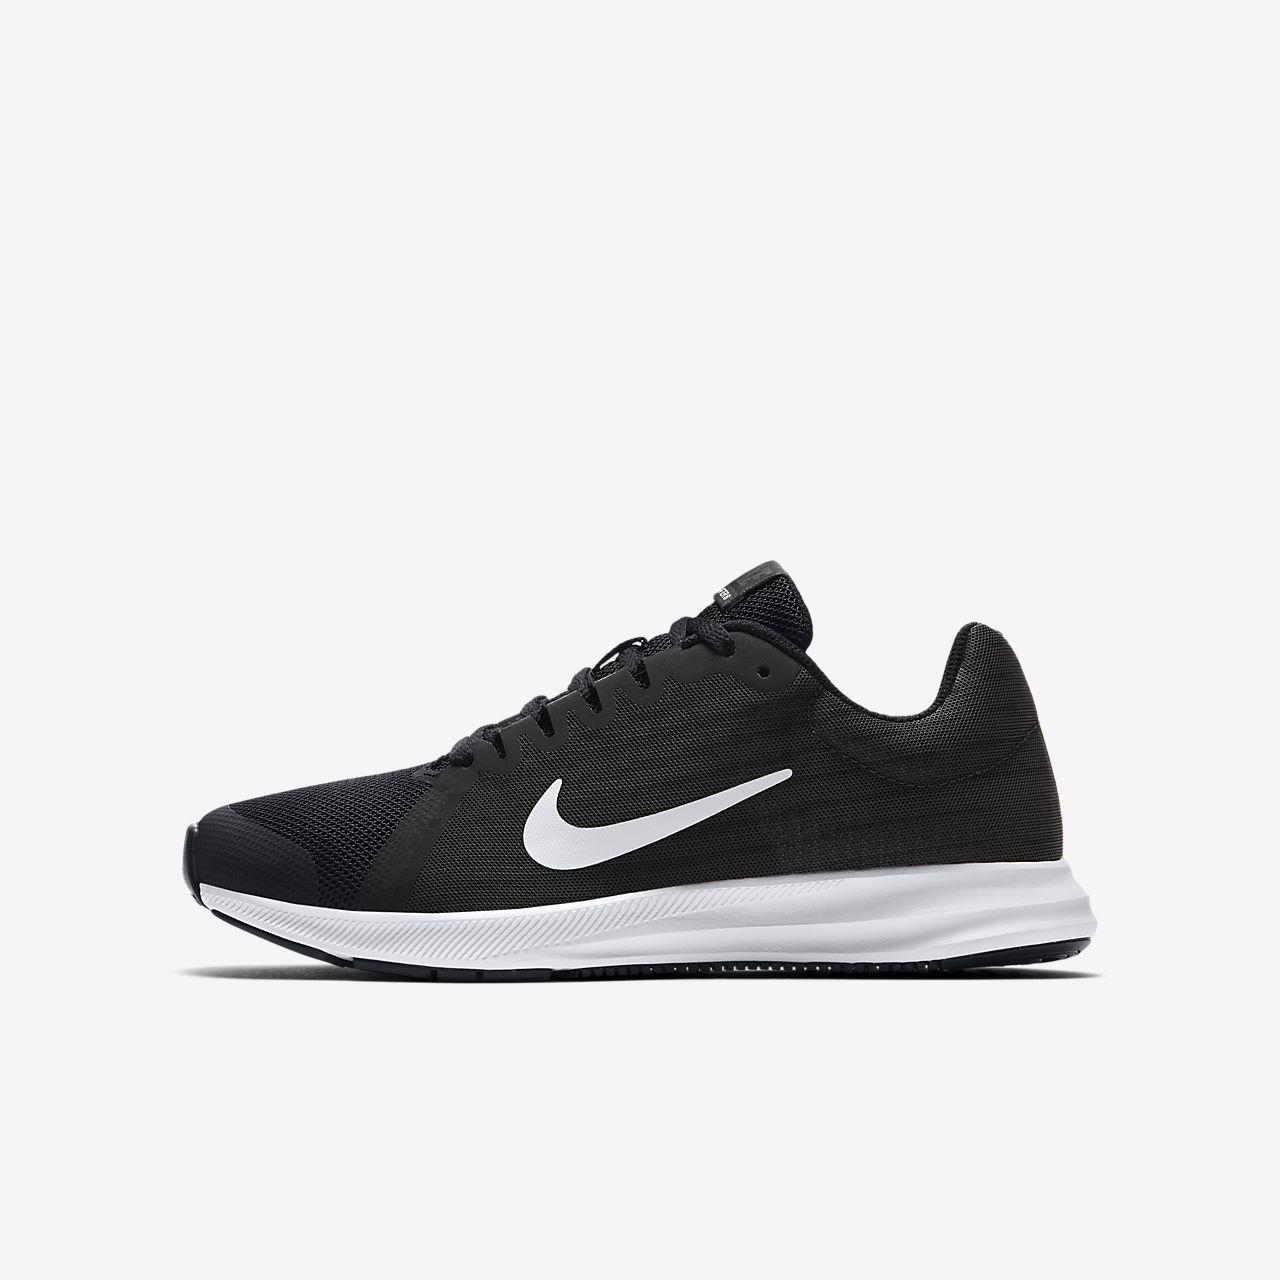 4d824df641d Sapatilhas de running Nike Downshifter 8 Júnior (Rapaz). Nike.com PT